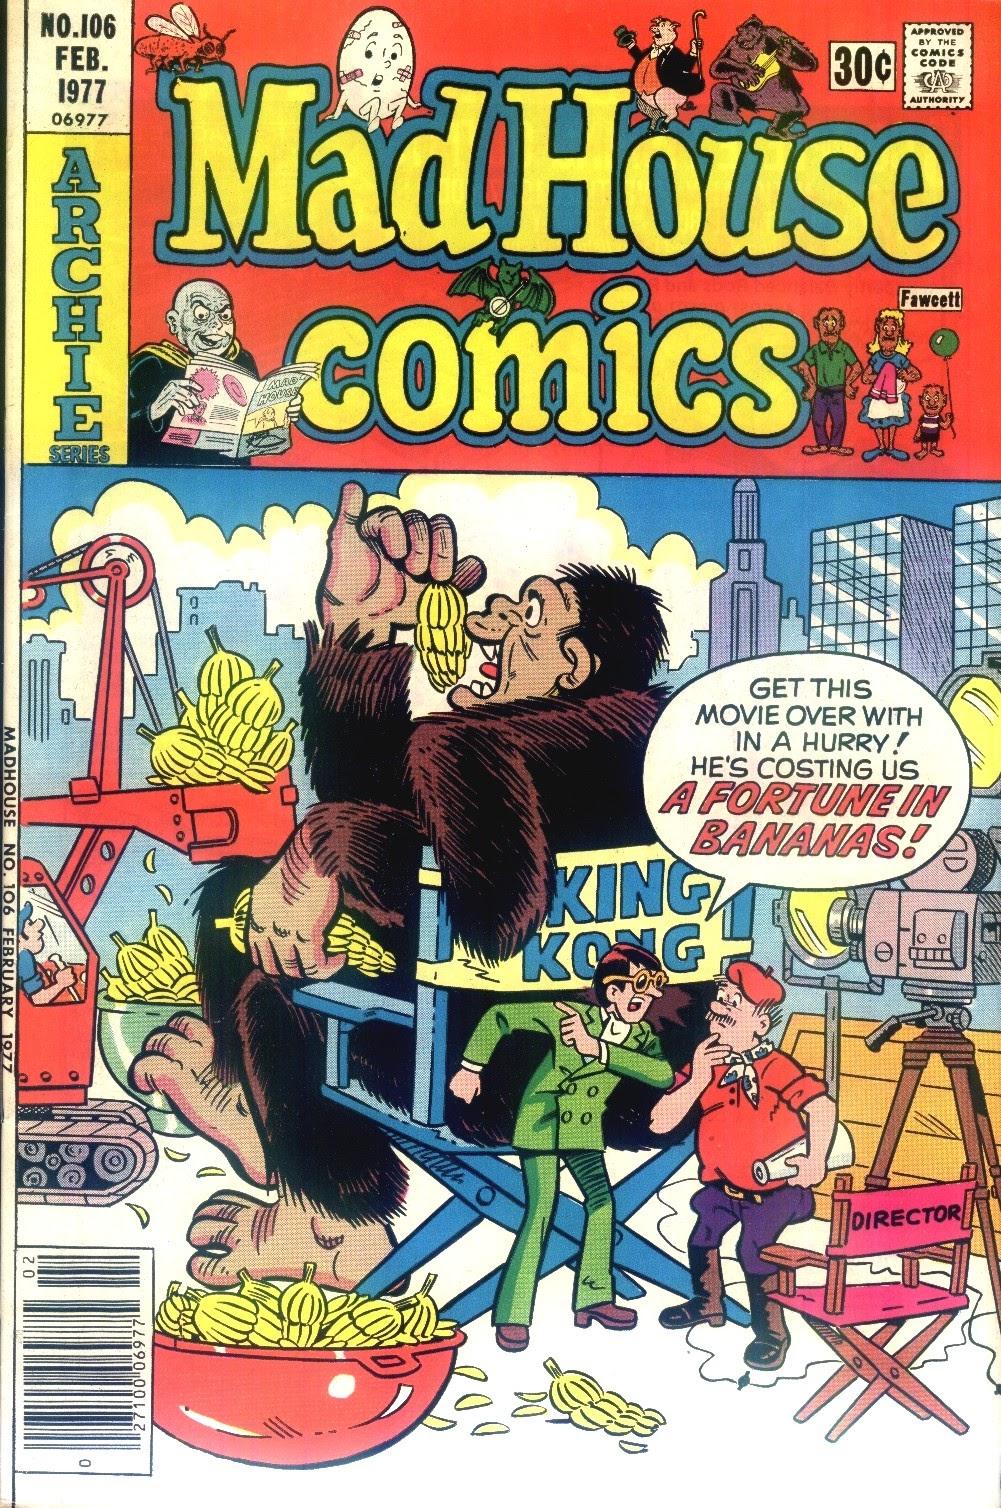 Madhouse Comics 106 Page 1